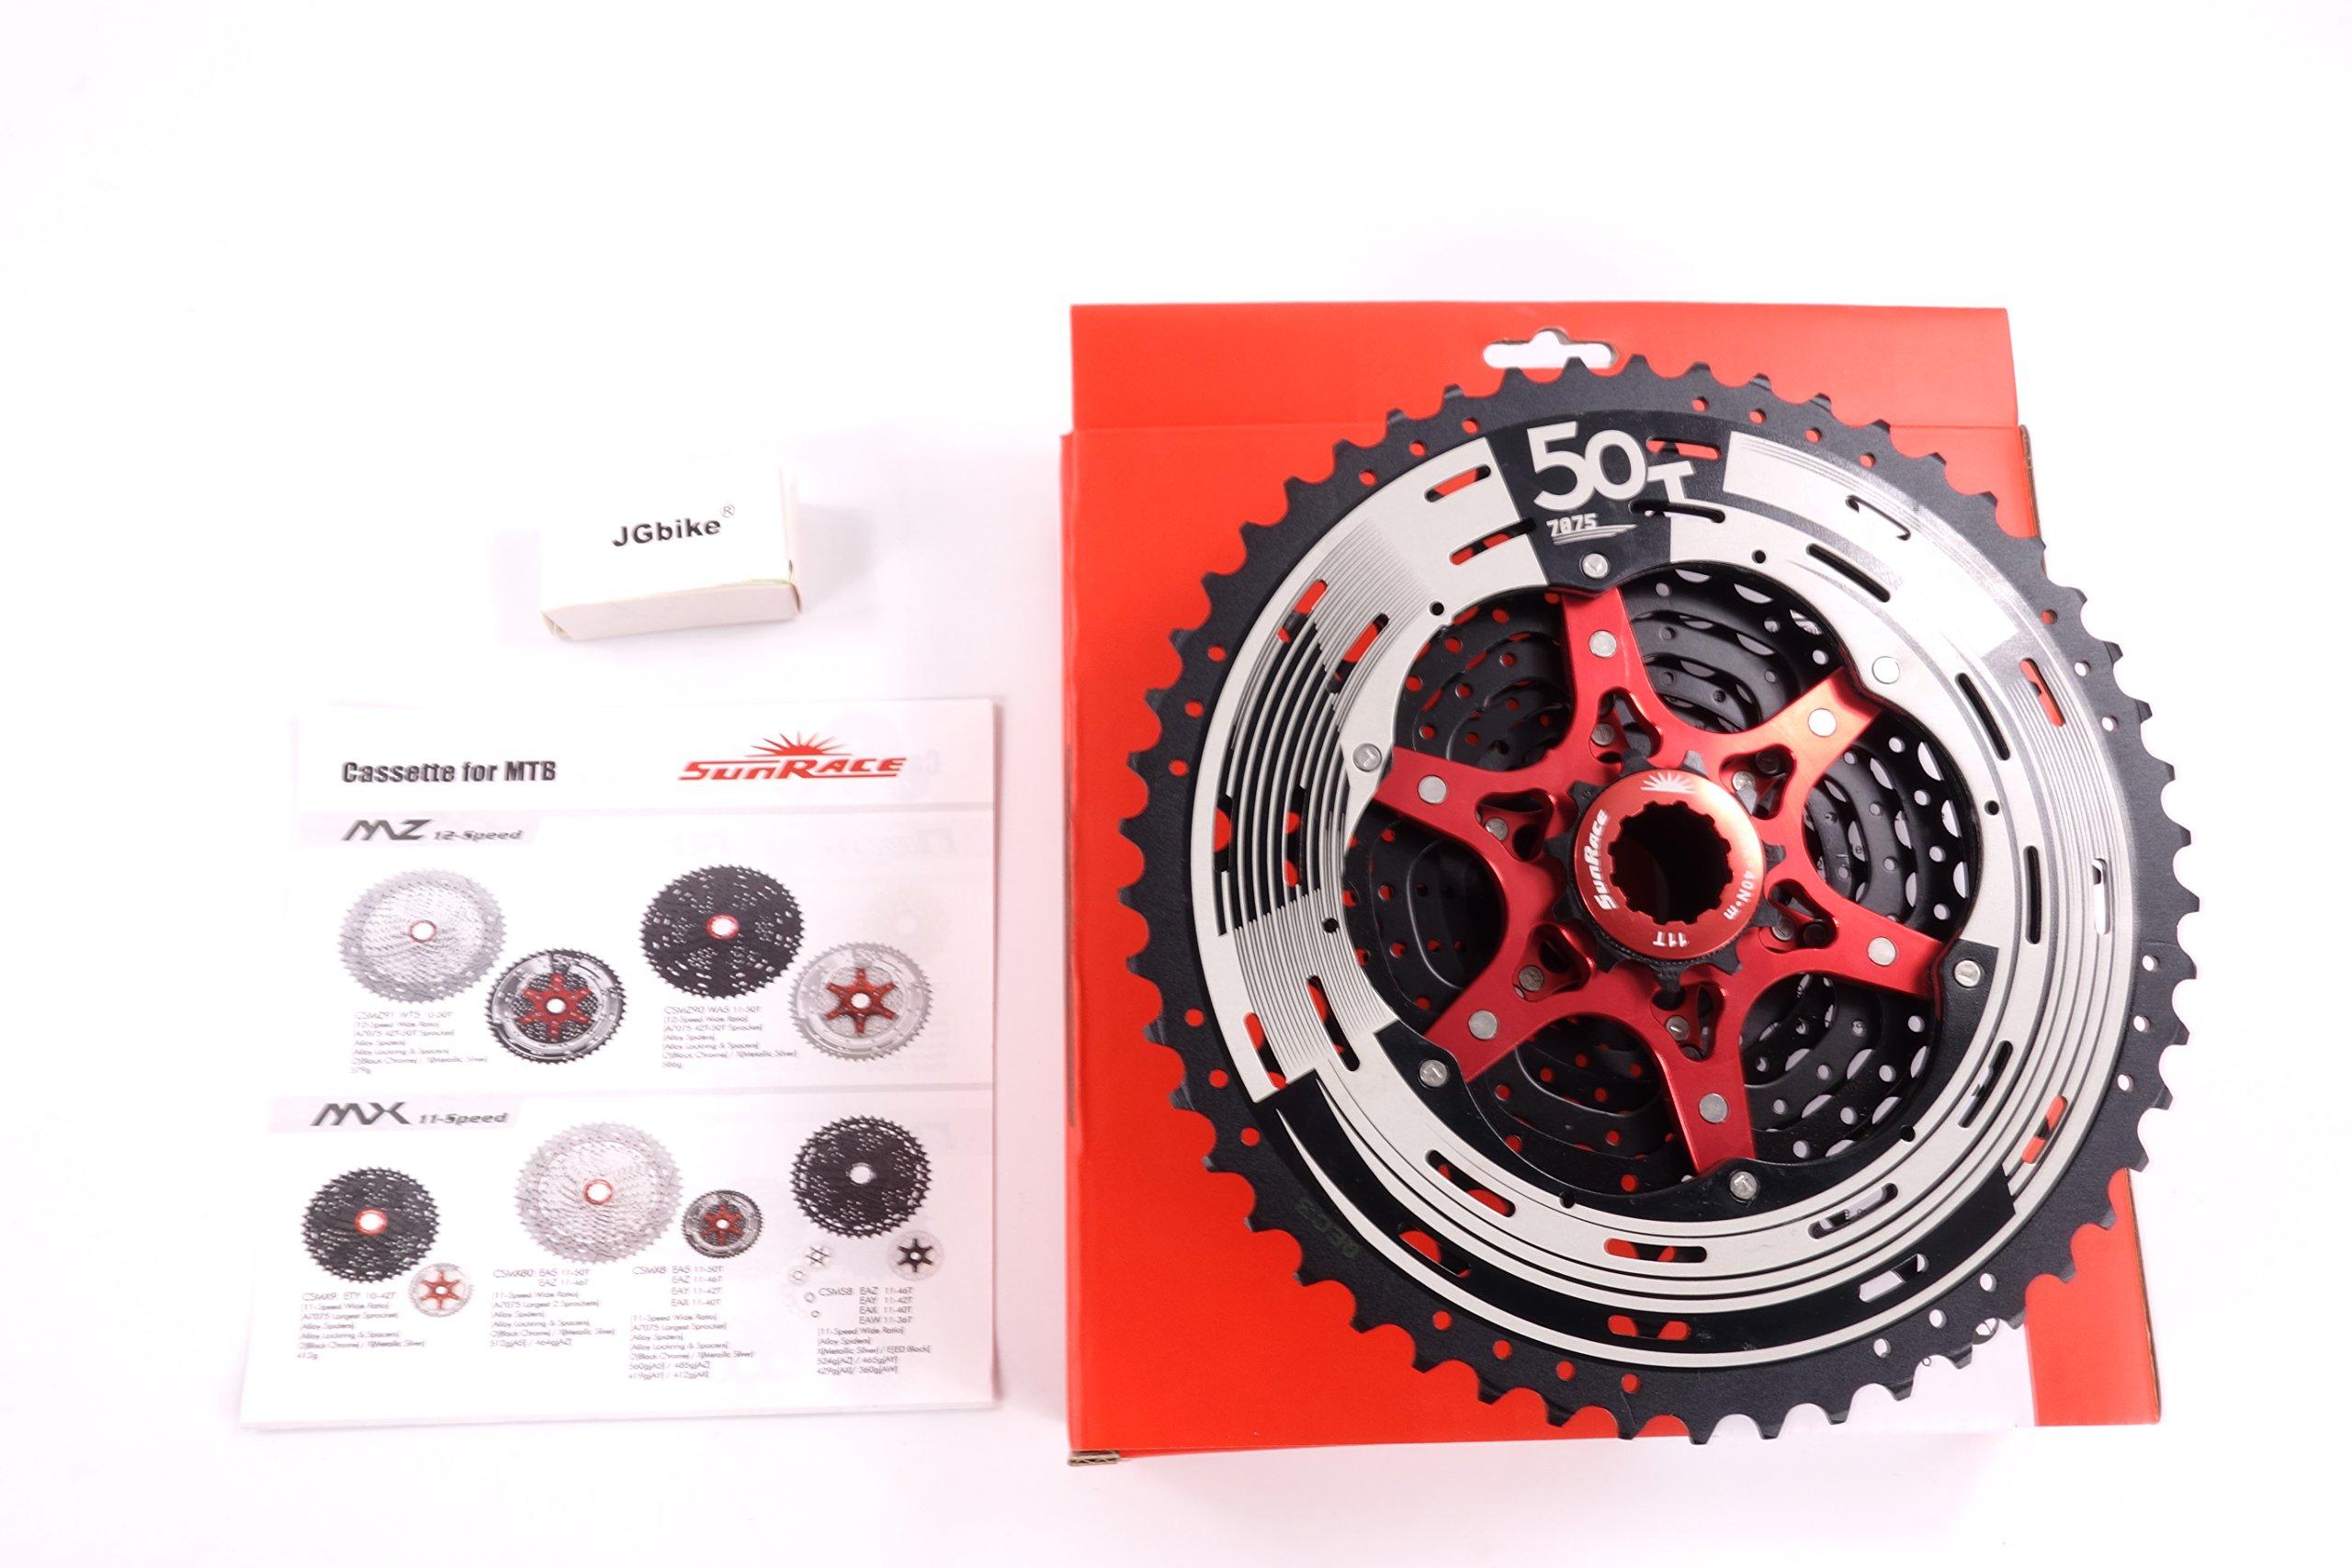 Sunrace 12-speed 11-50T cassette freewheel CSMZ90 WA5 wide ratio MTB in Black with RD extender by JGbike (Image #2)